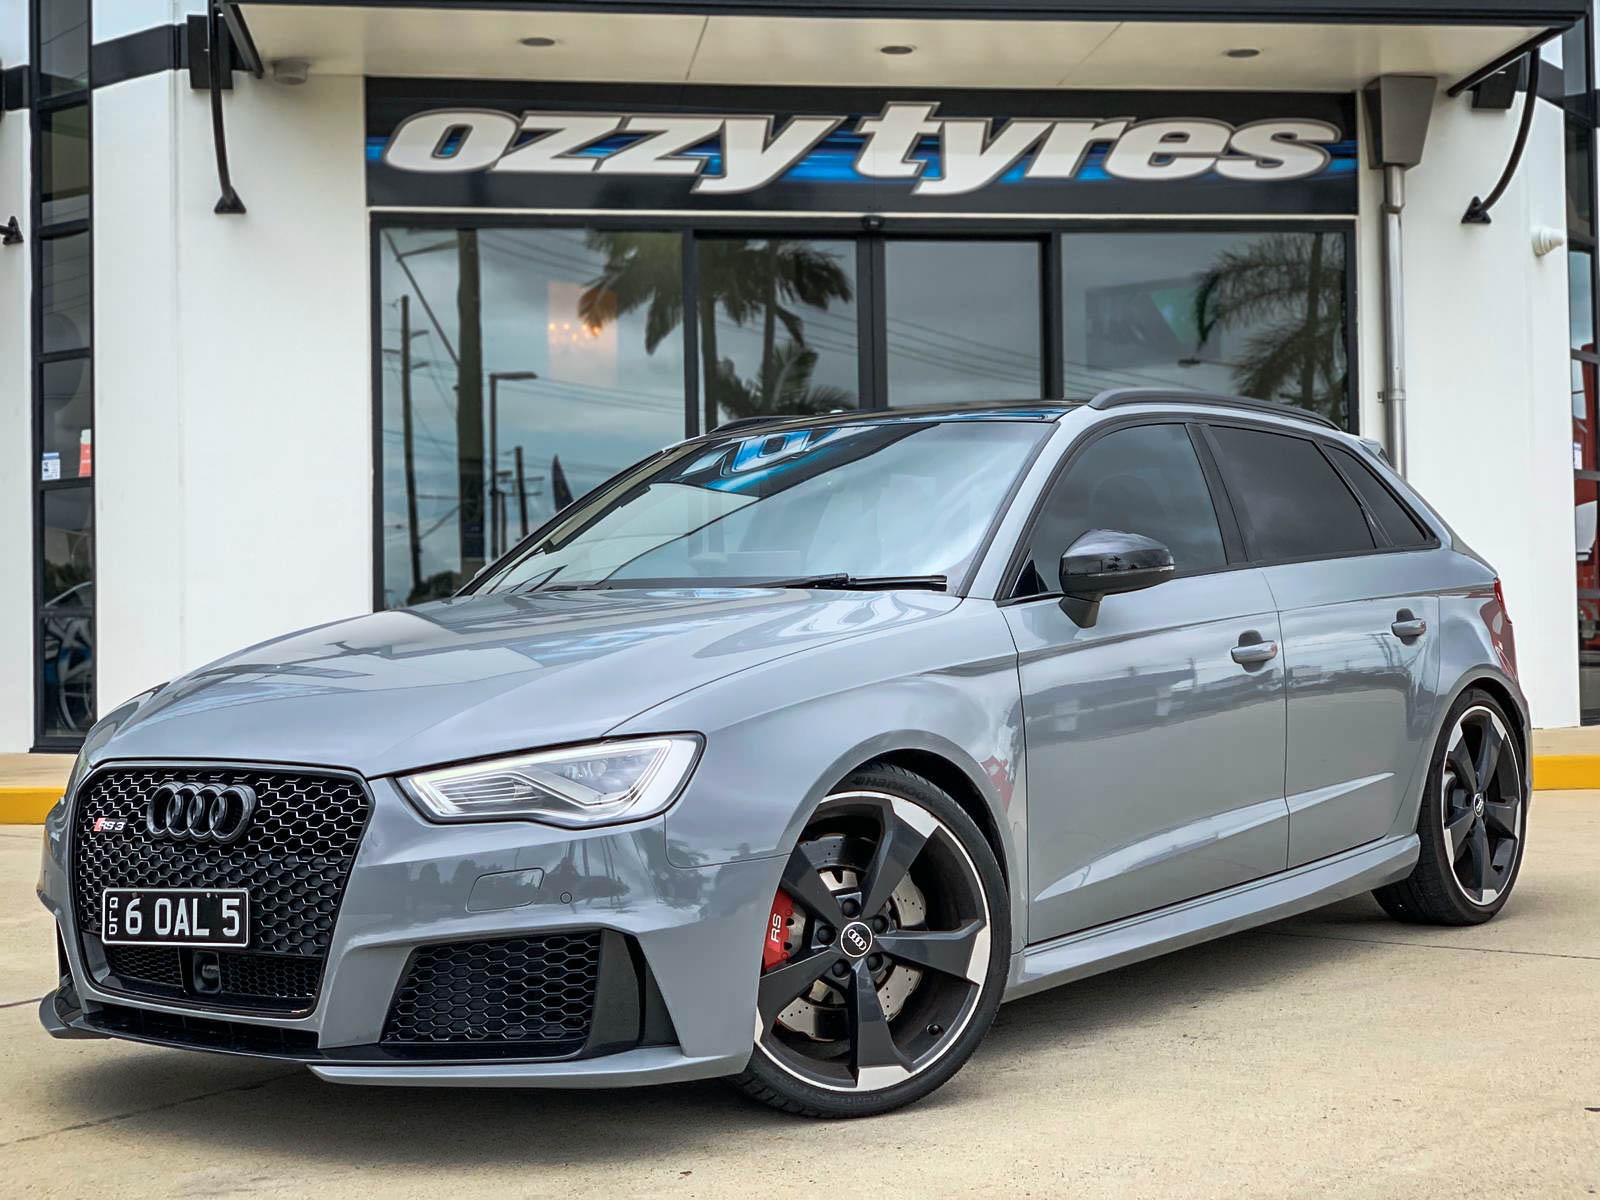 Audi rs3 on Hussla MOZ gloss black 1 of 5 1